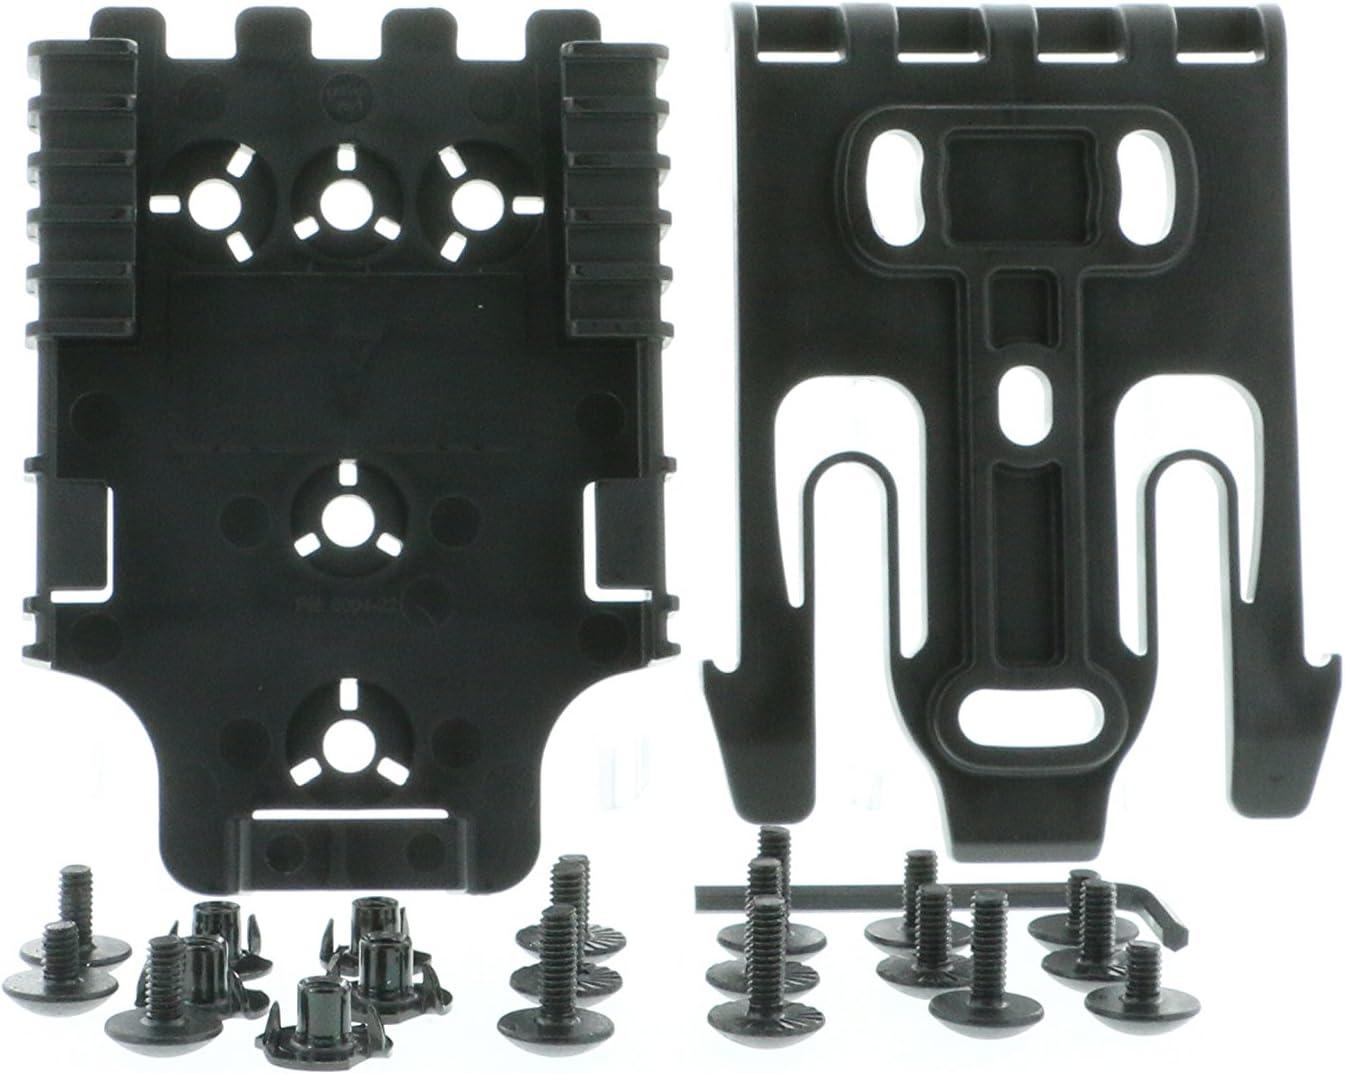 Safariland QLS Kit, (1 ea.) QLS 19 Fork & (2 ea.) QLS 22 Receivers Holsters, Black, Single Kit Only, One Size (1141786)